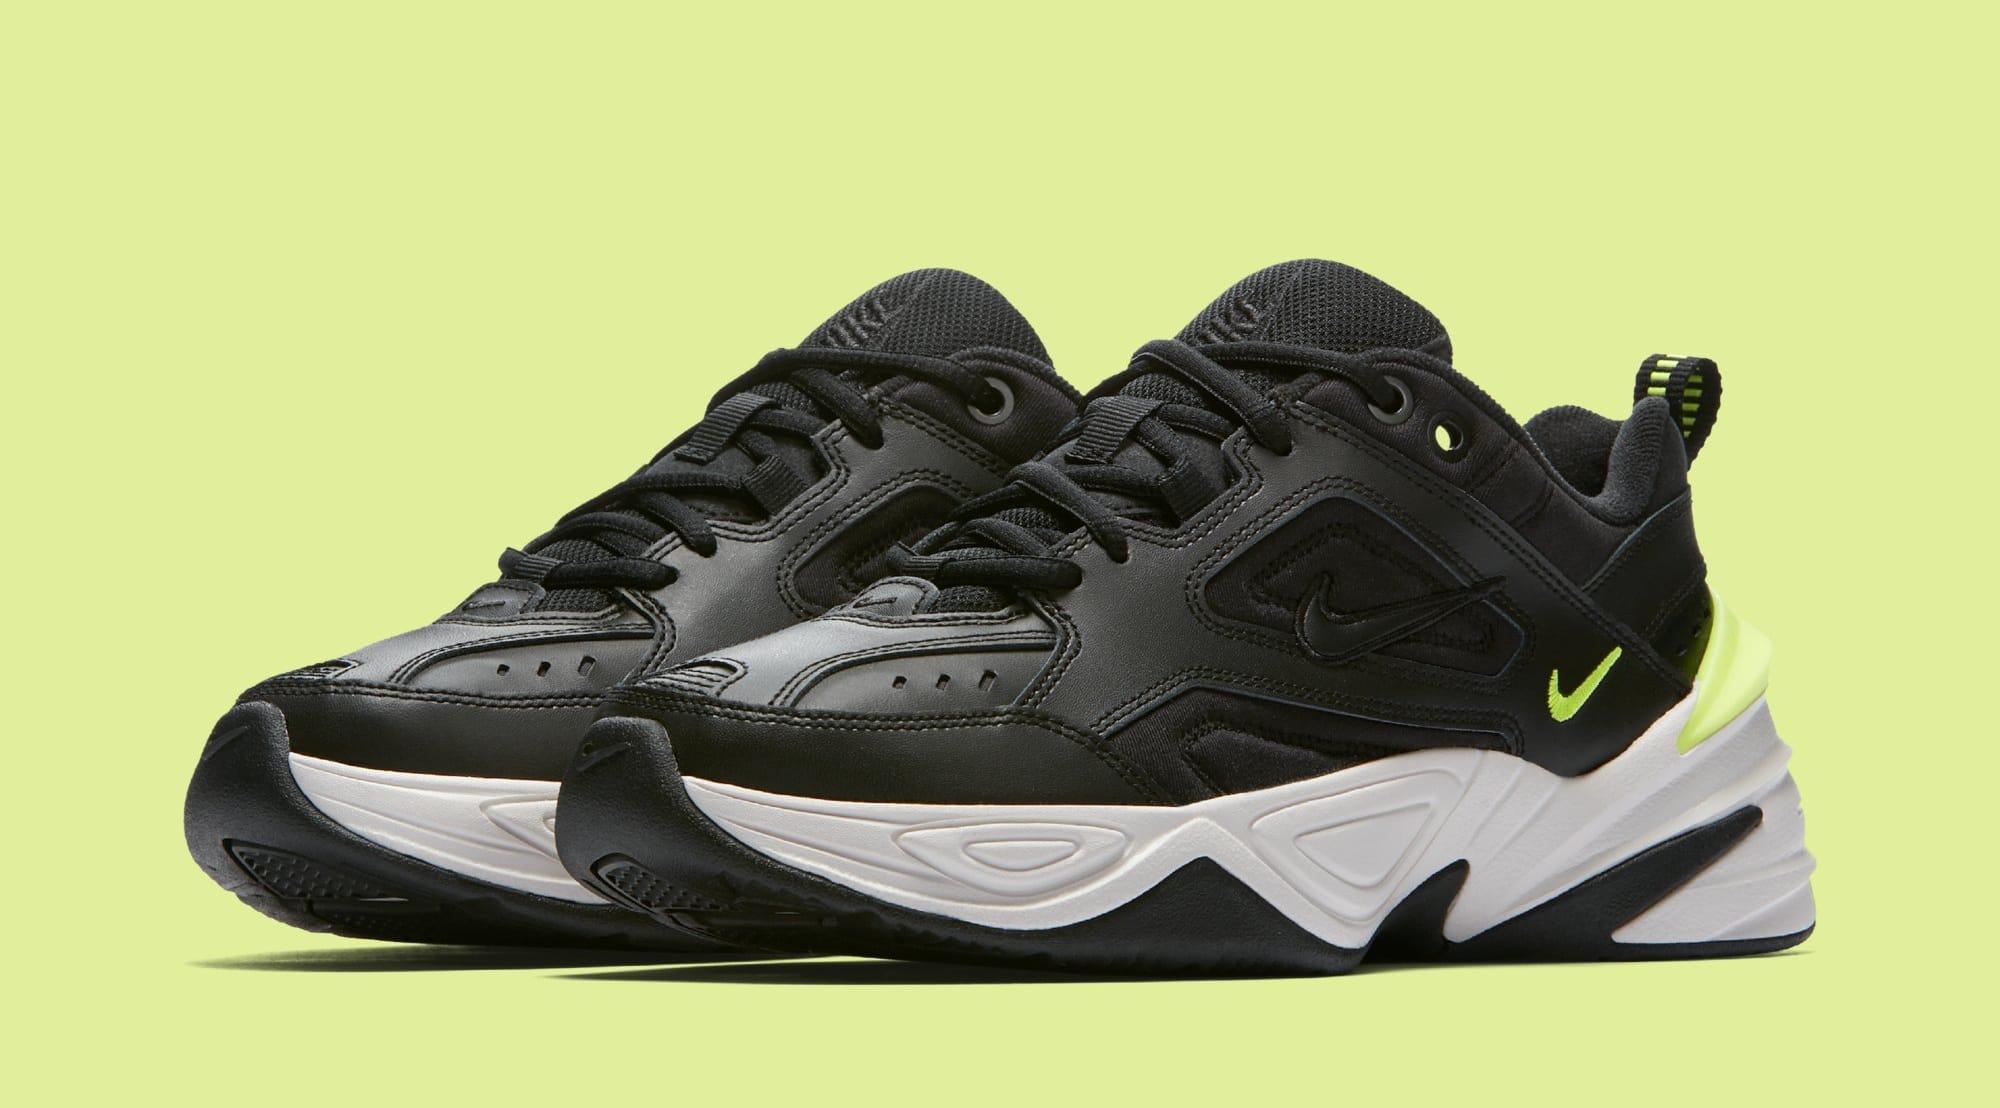 Nike Wmns M2K Tekno Phantom Volt Women Daddy Shoes Sneakers AO3108-002